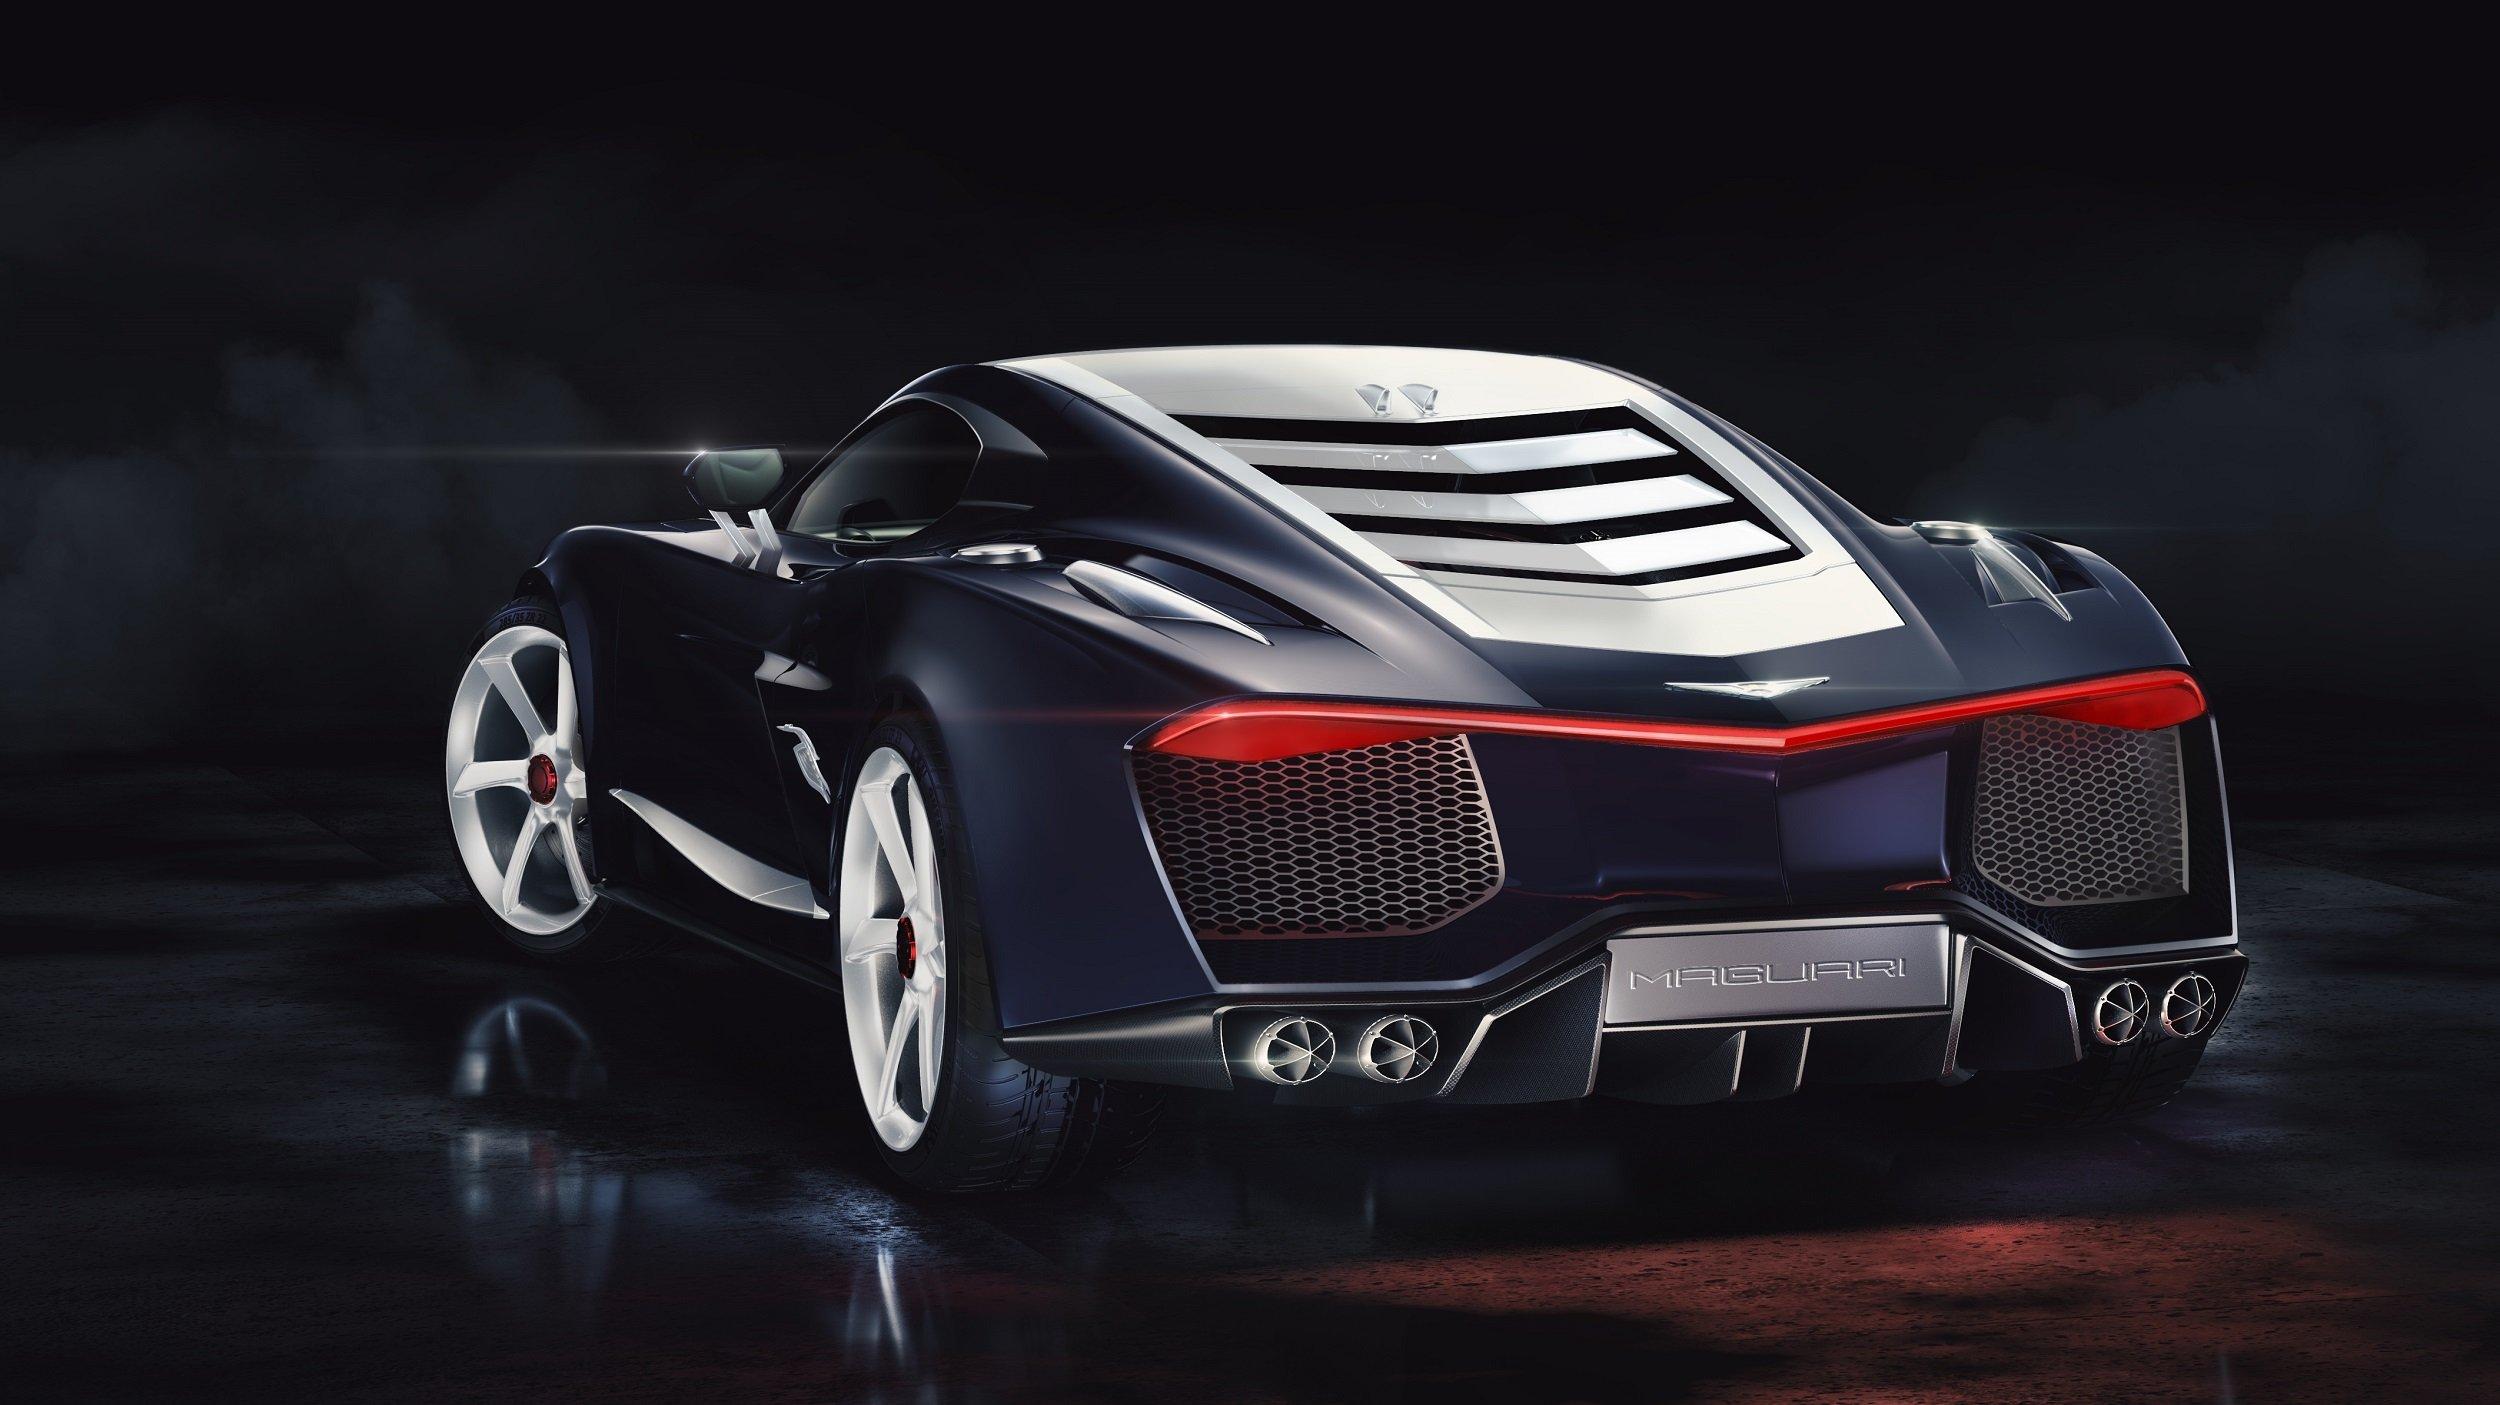 Компания Hispano Suiza представила новый суперкар